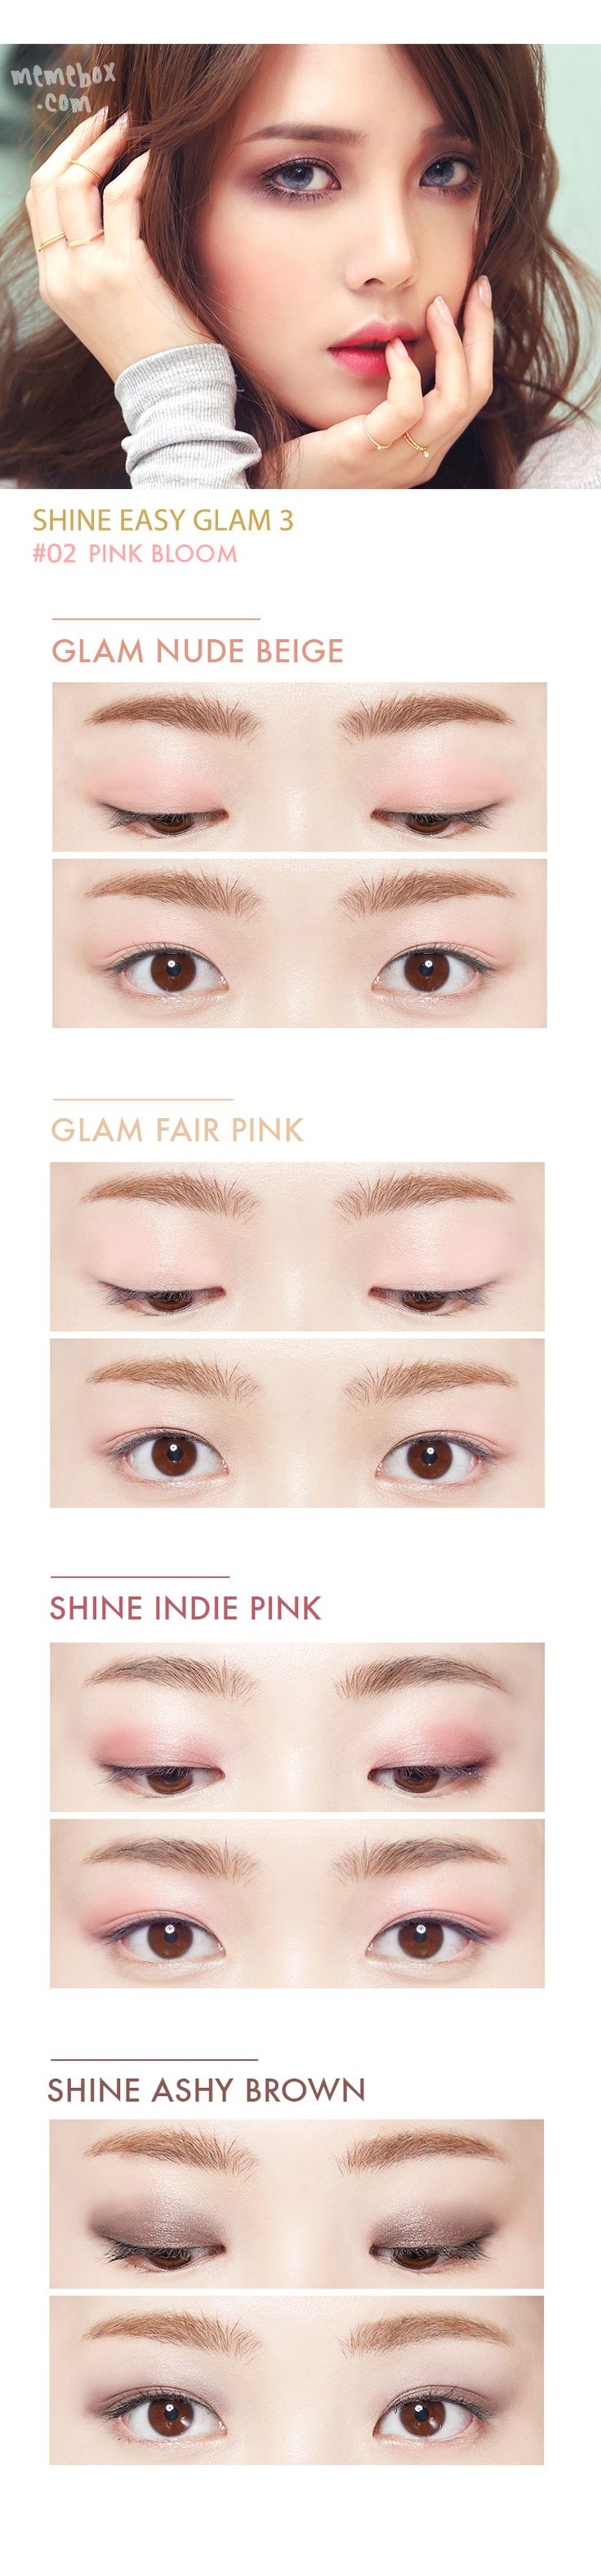 MEMEBOX Pony Shine Easy Glam Eyeshadow 3 #02 Pink Bloom - OPbeauty 美容化妝專門店